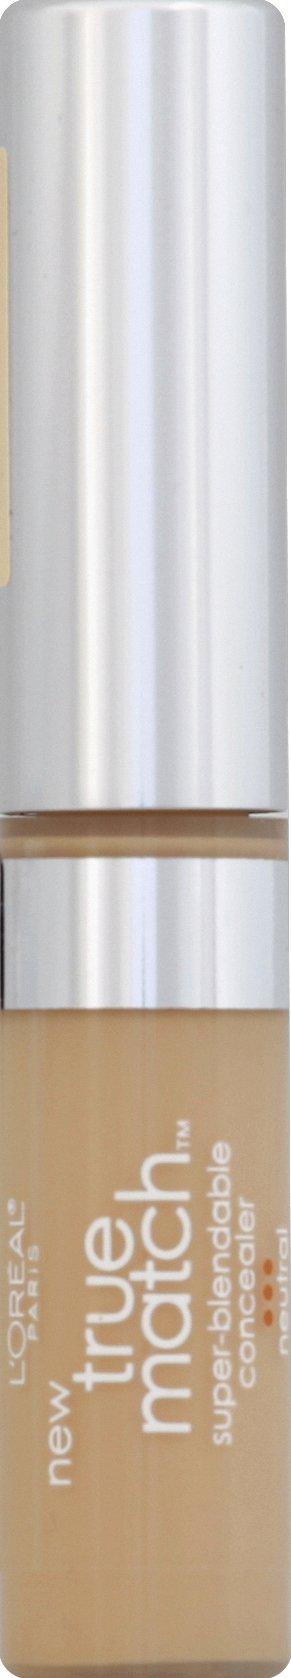 L'Oreal True Match Concealer Fair/Light Neutral